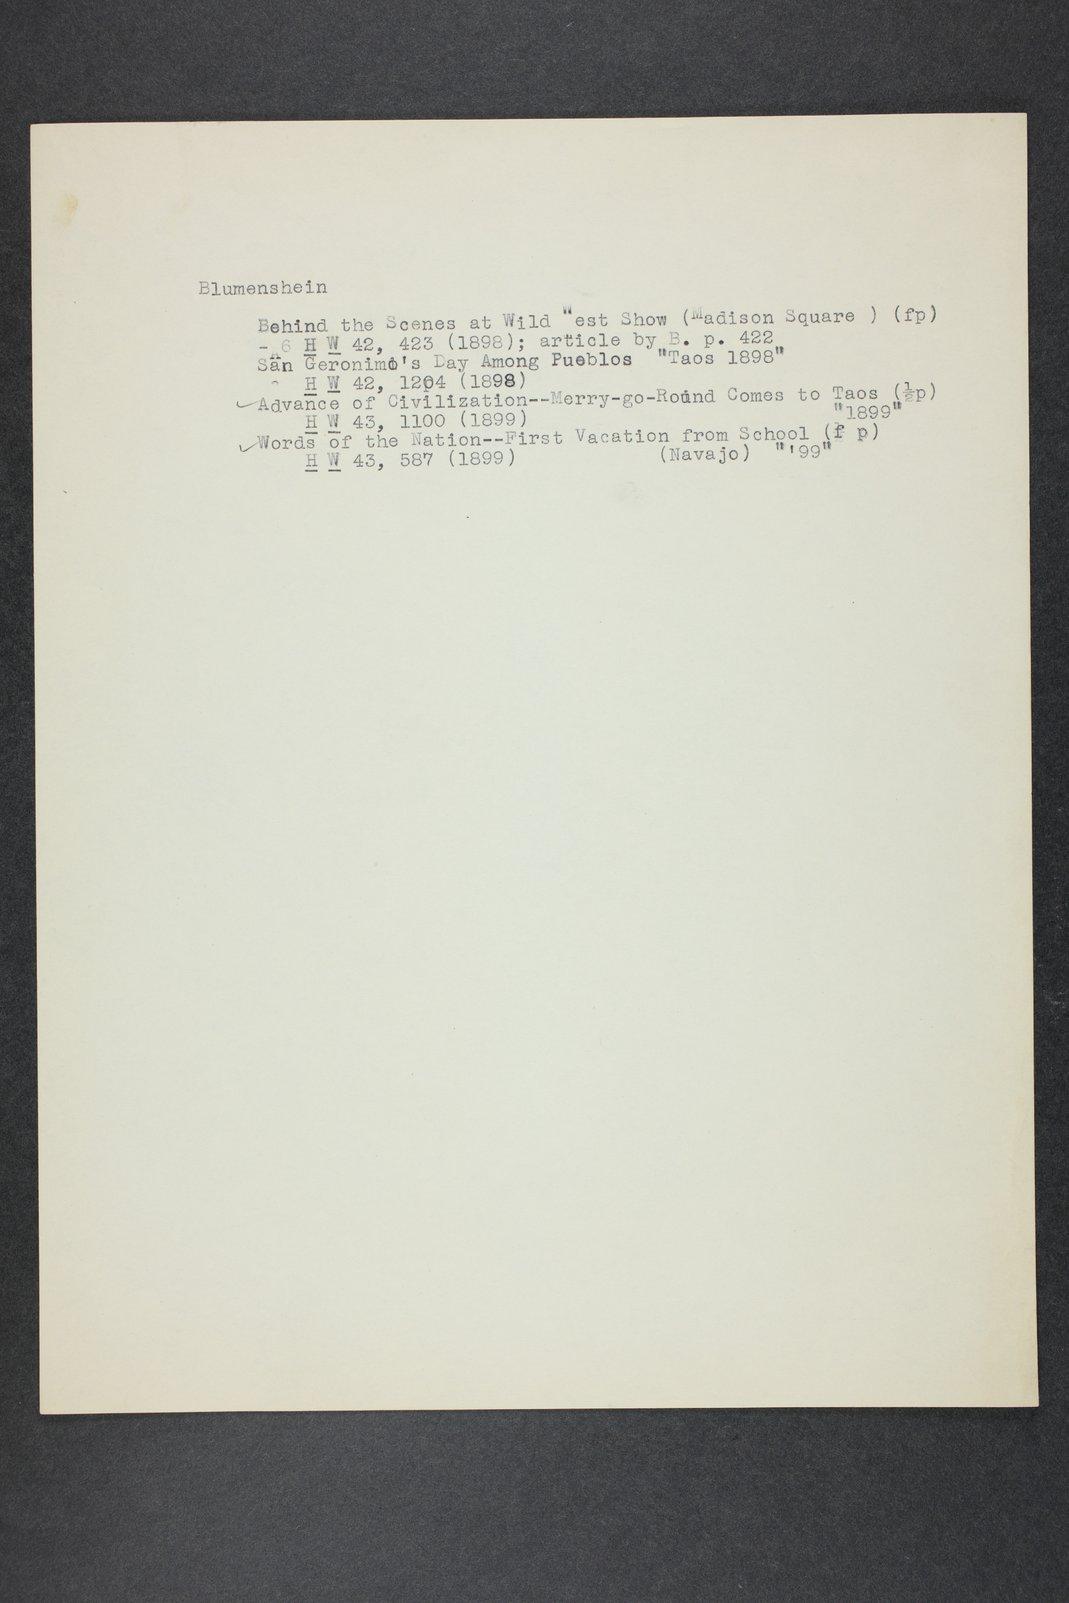 Robert Taft correspondence related to frontier artists, Blumenshein - Cary - 12